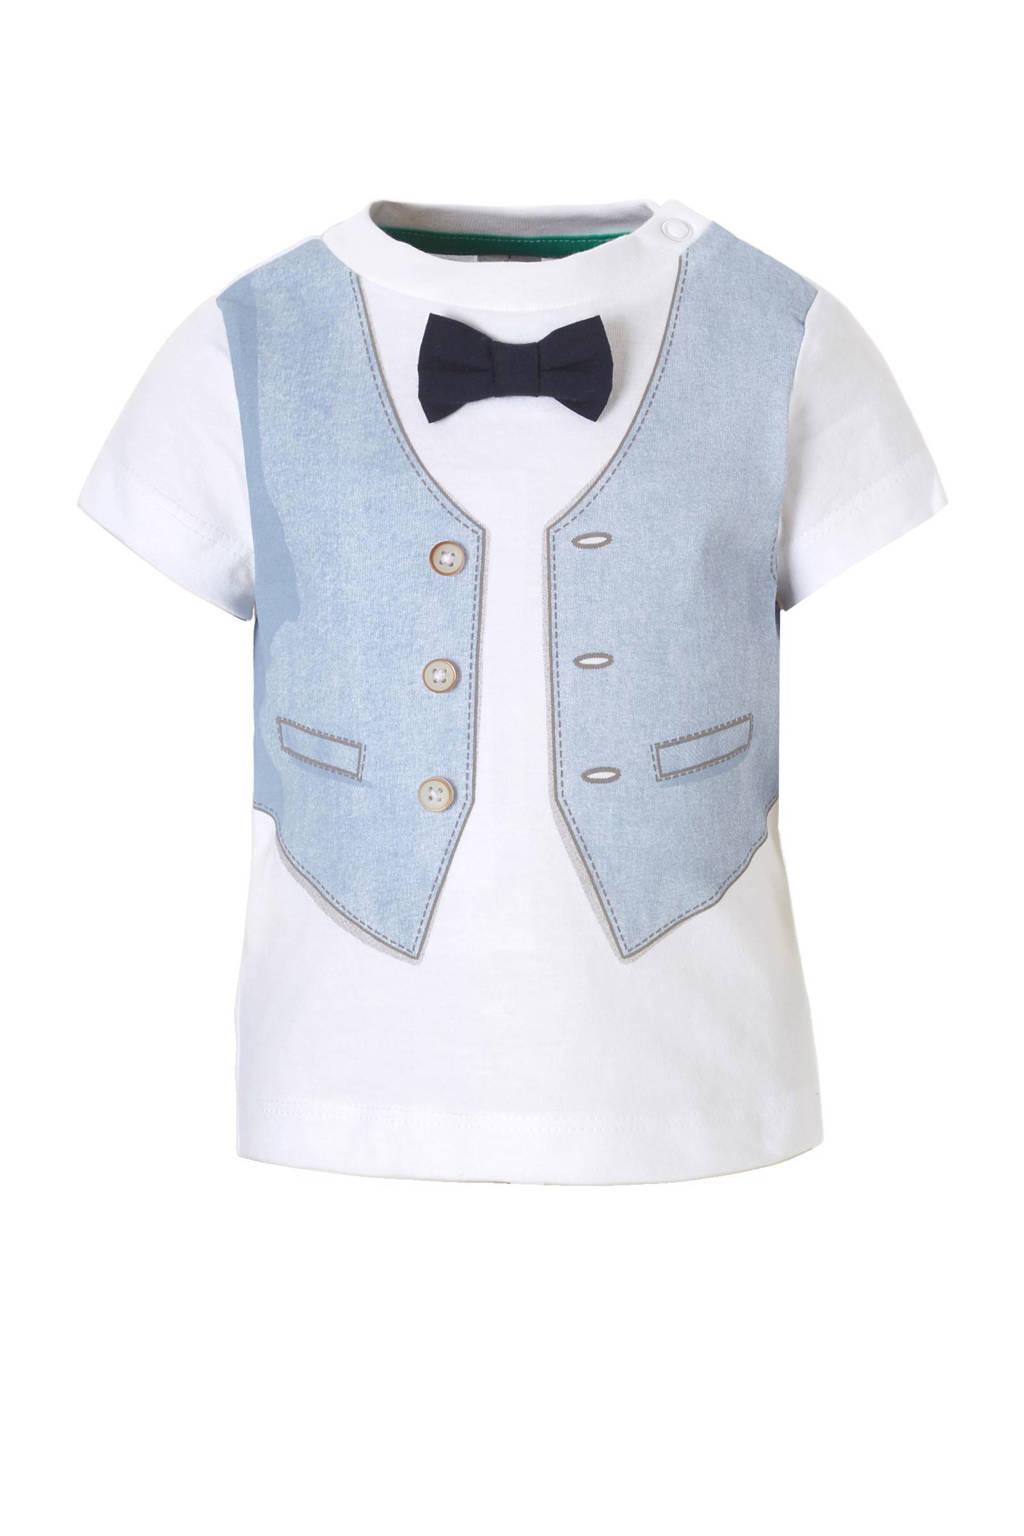 C&A Baby Club T-shirt met vlinderstrik, Wit/blauw